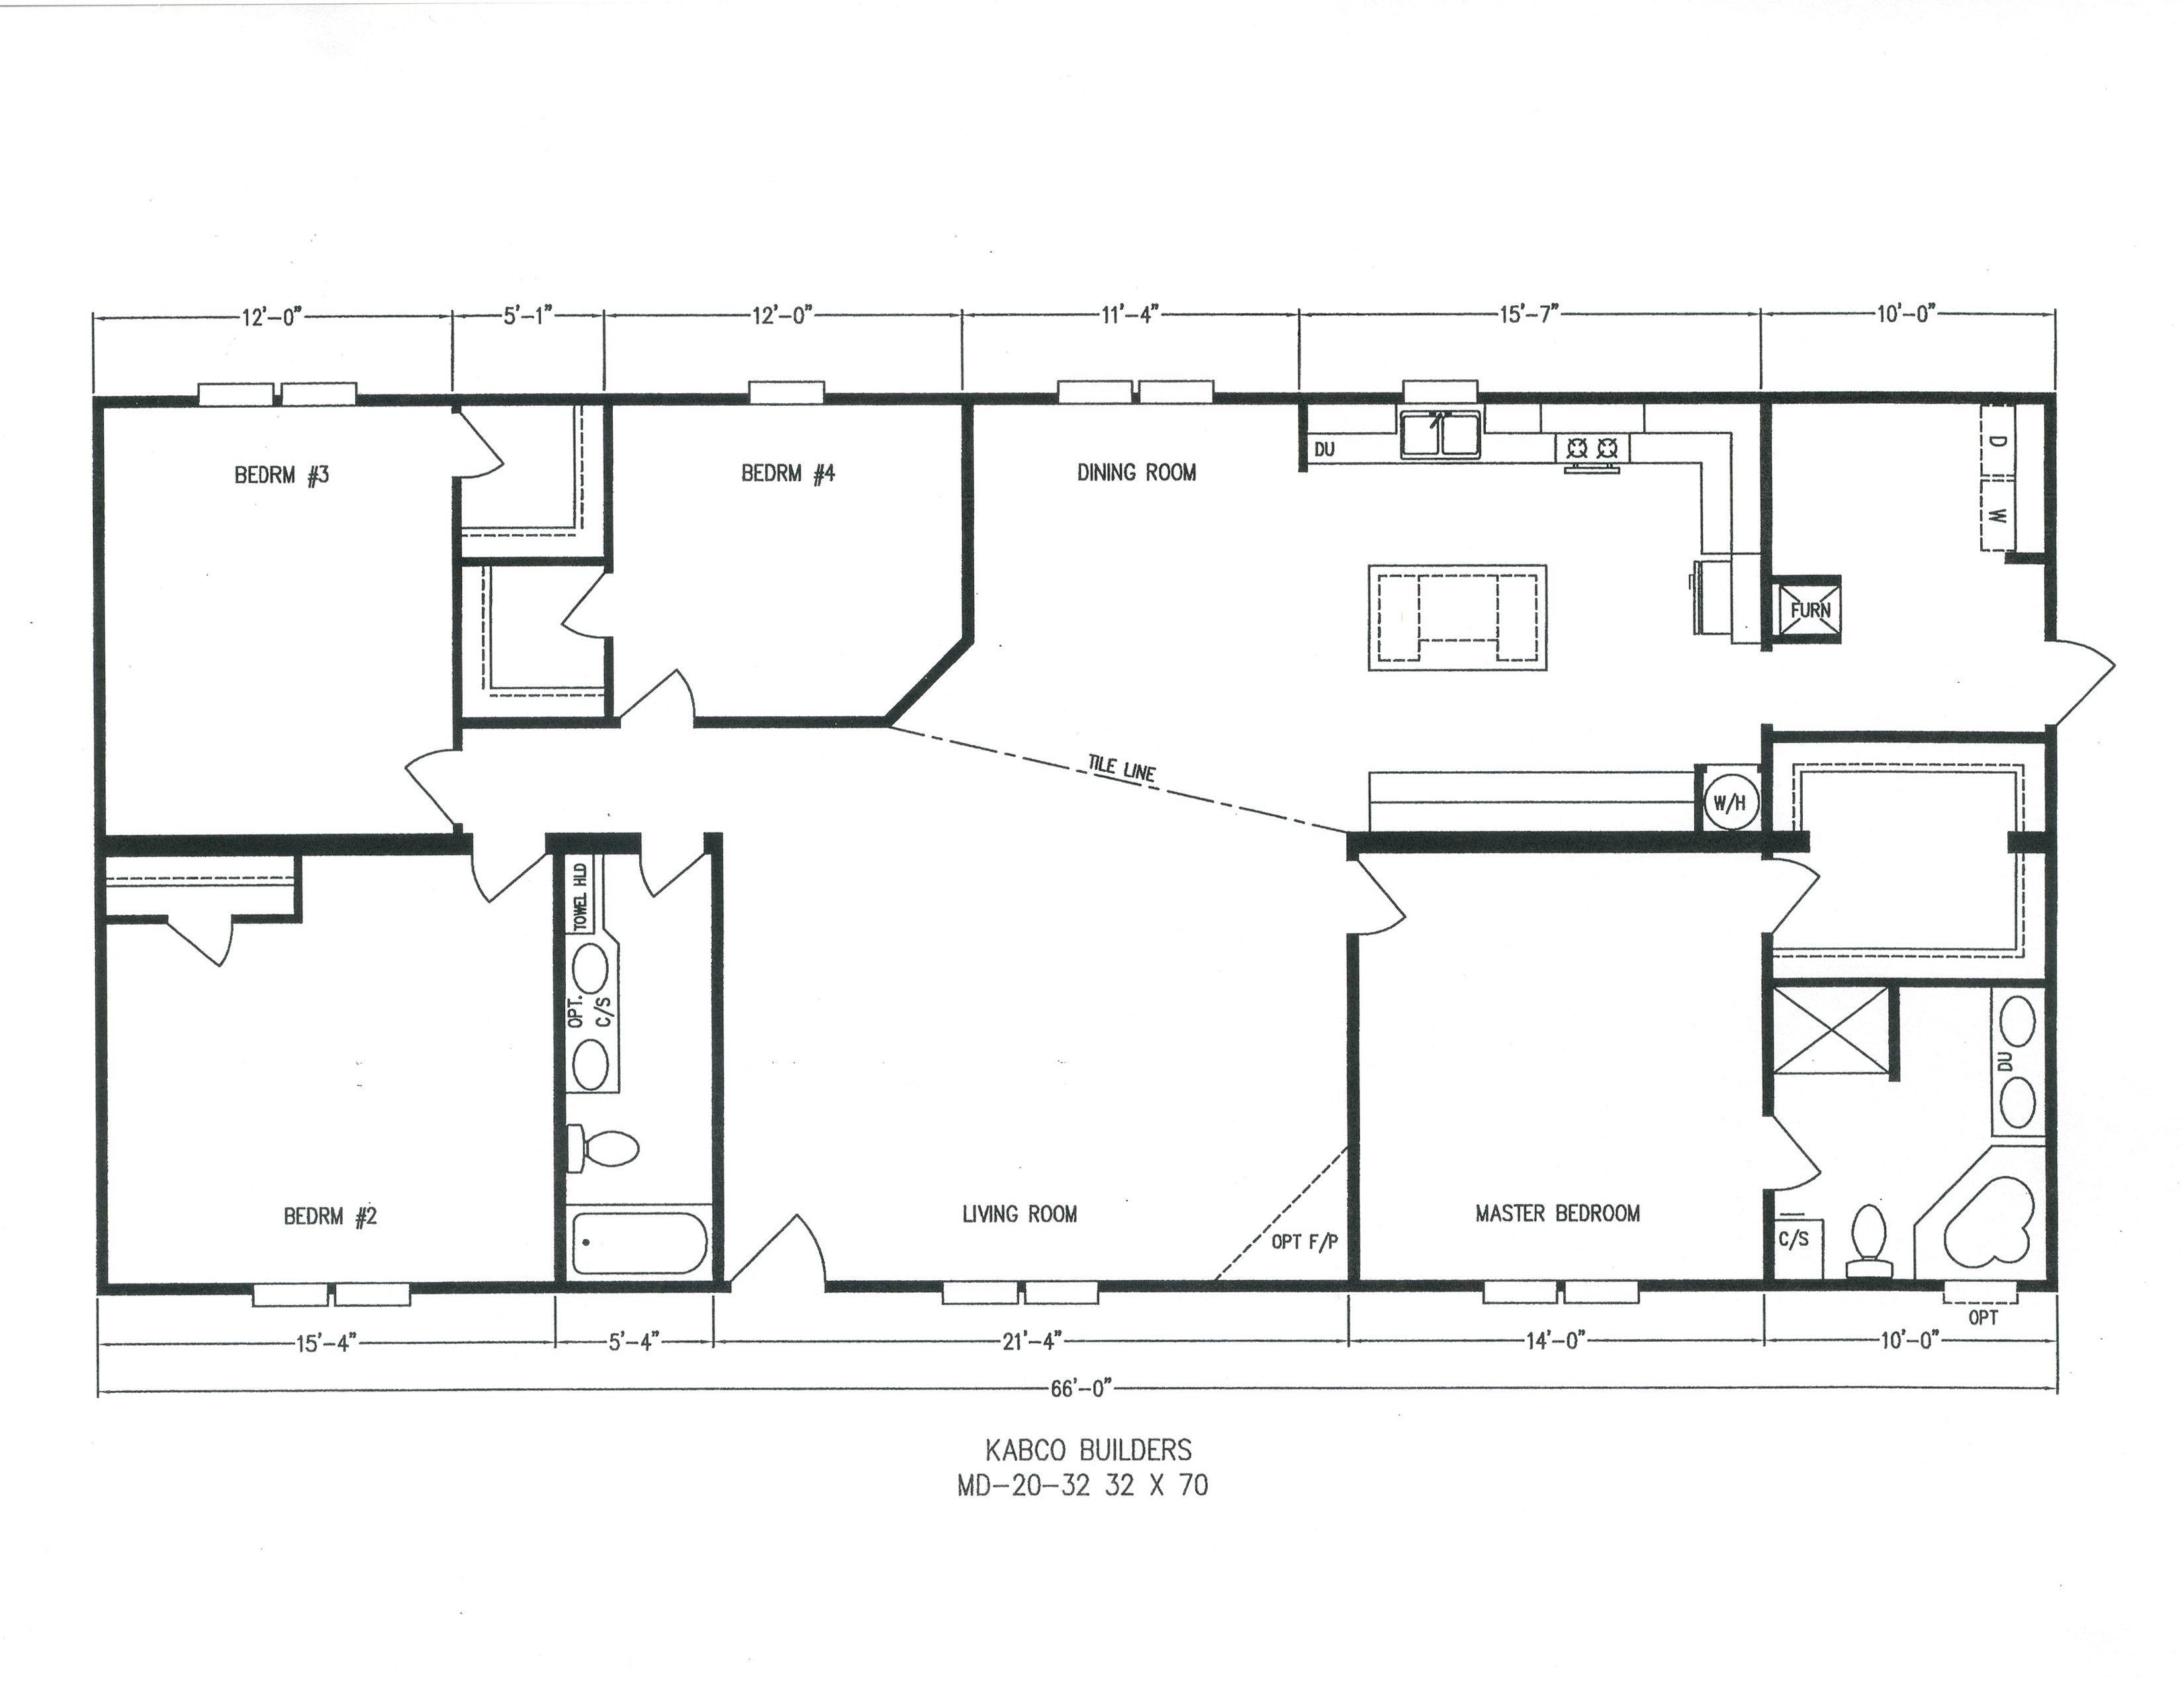 Kabco Builders Floor Plans How To Plan Builder